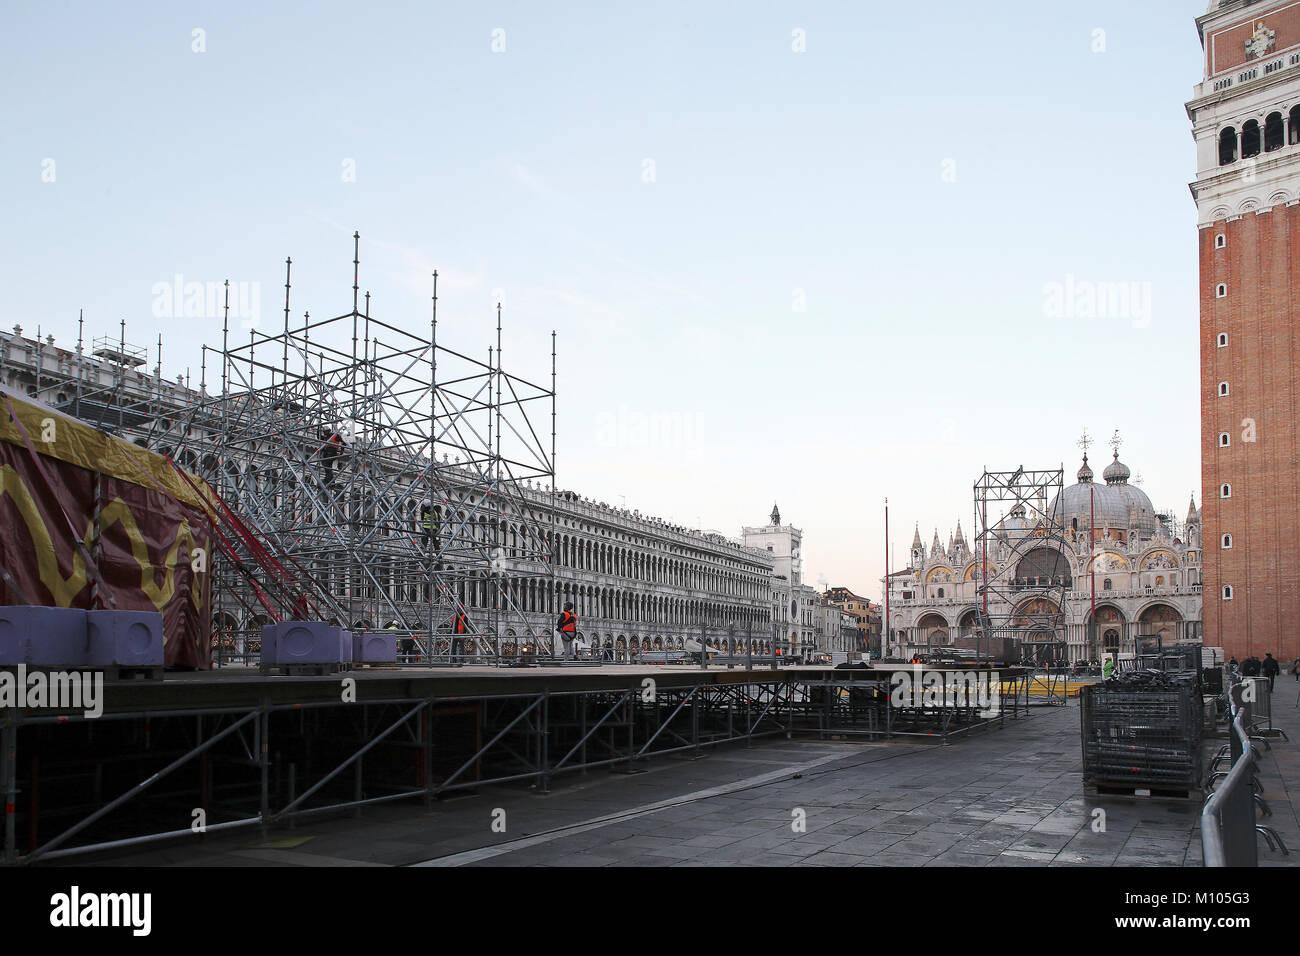 Moderno Marco De Gran Corazón Ornamento - Ideas Personalizadas de ...